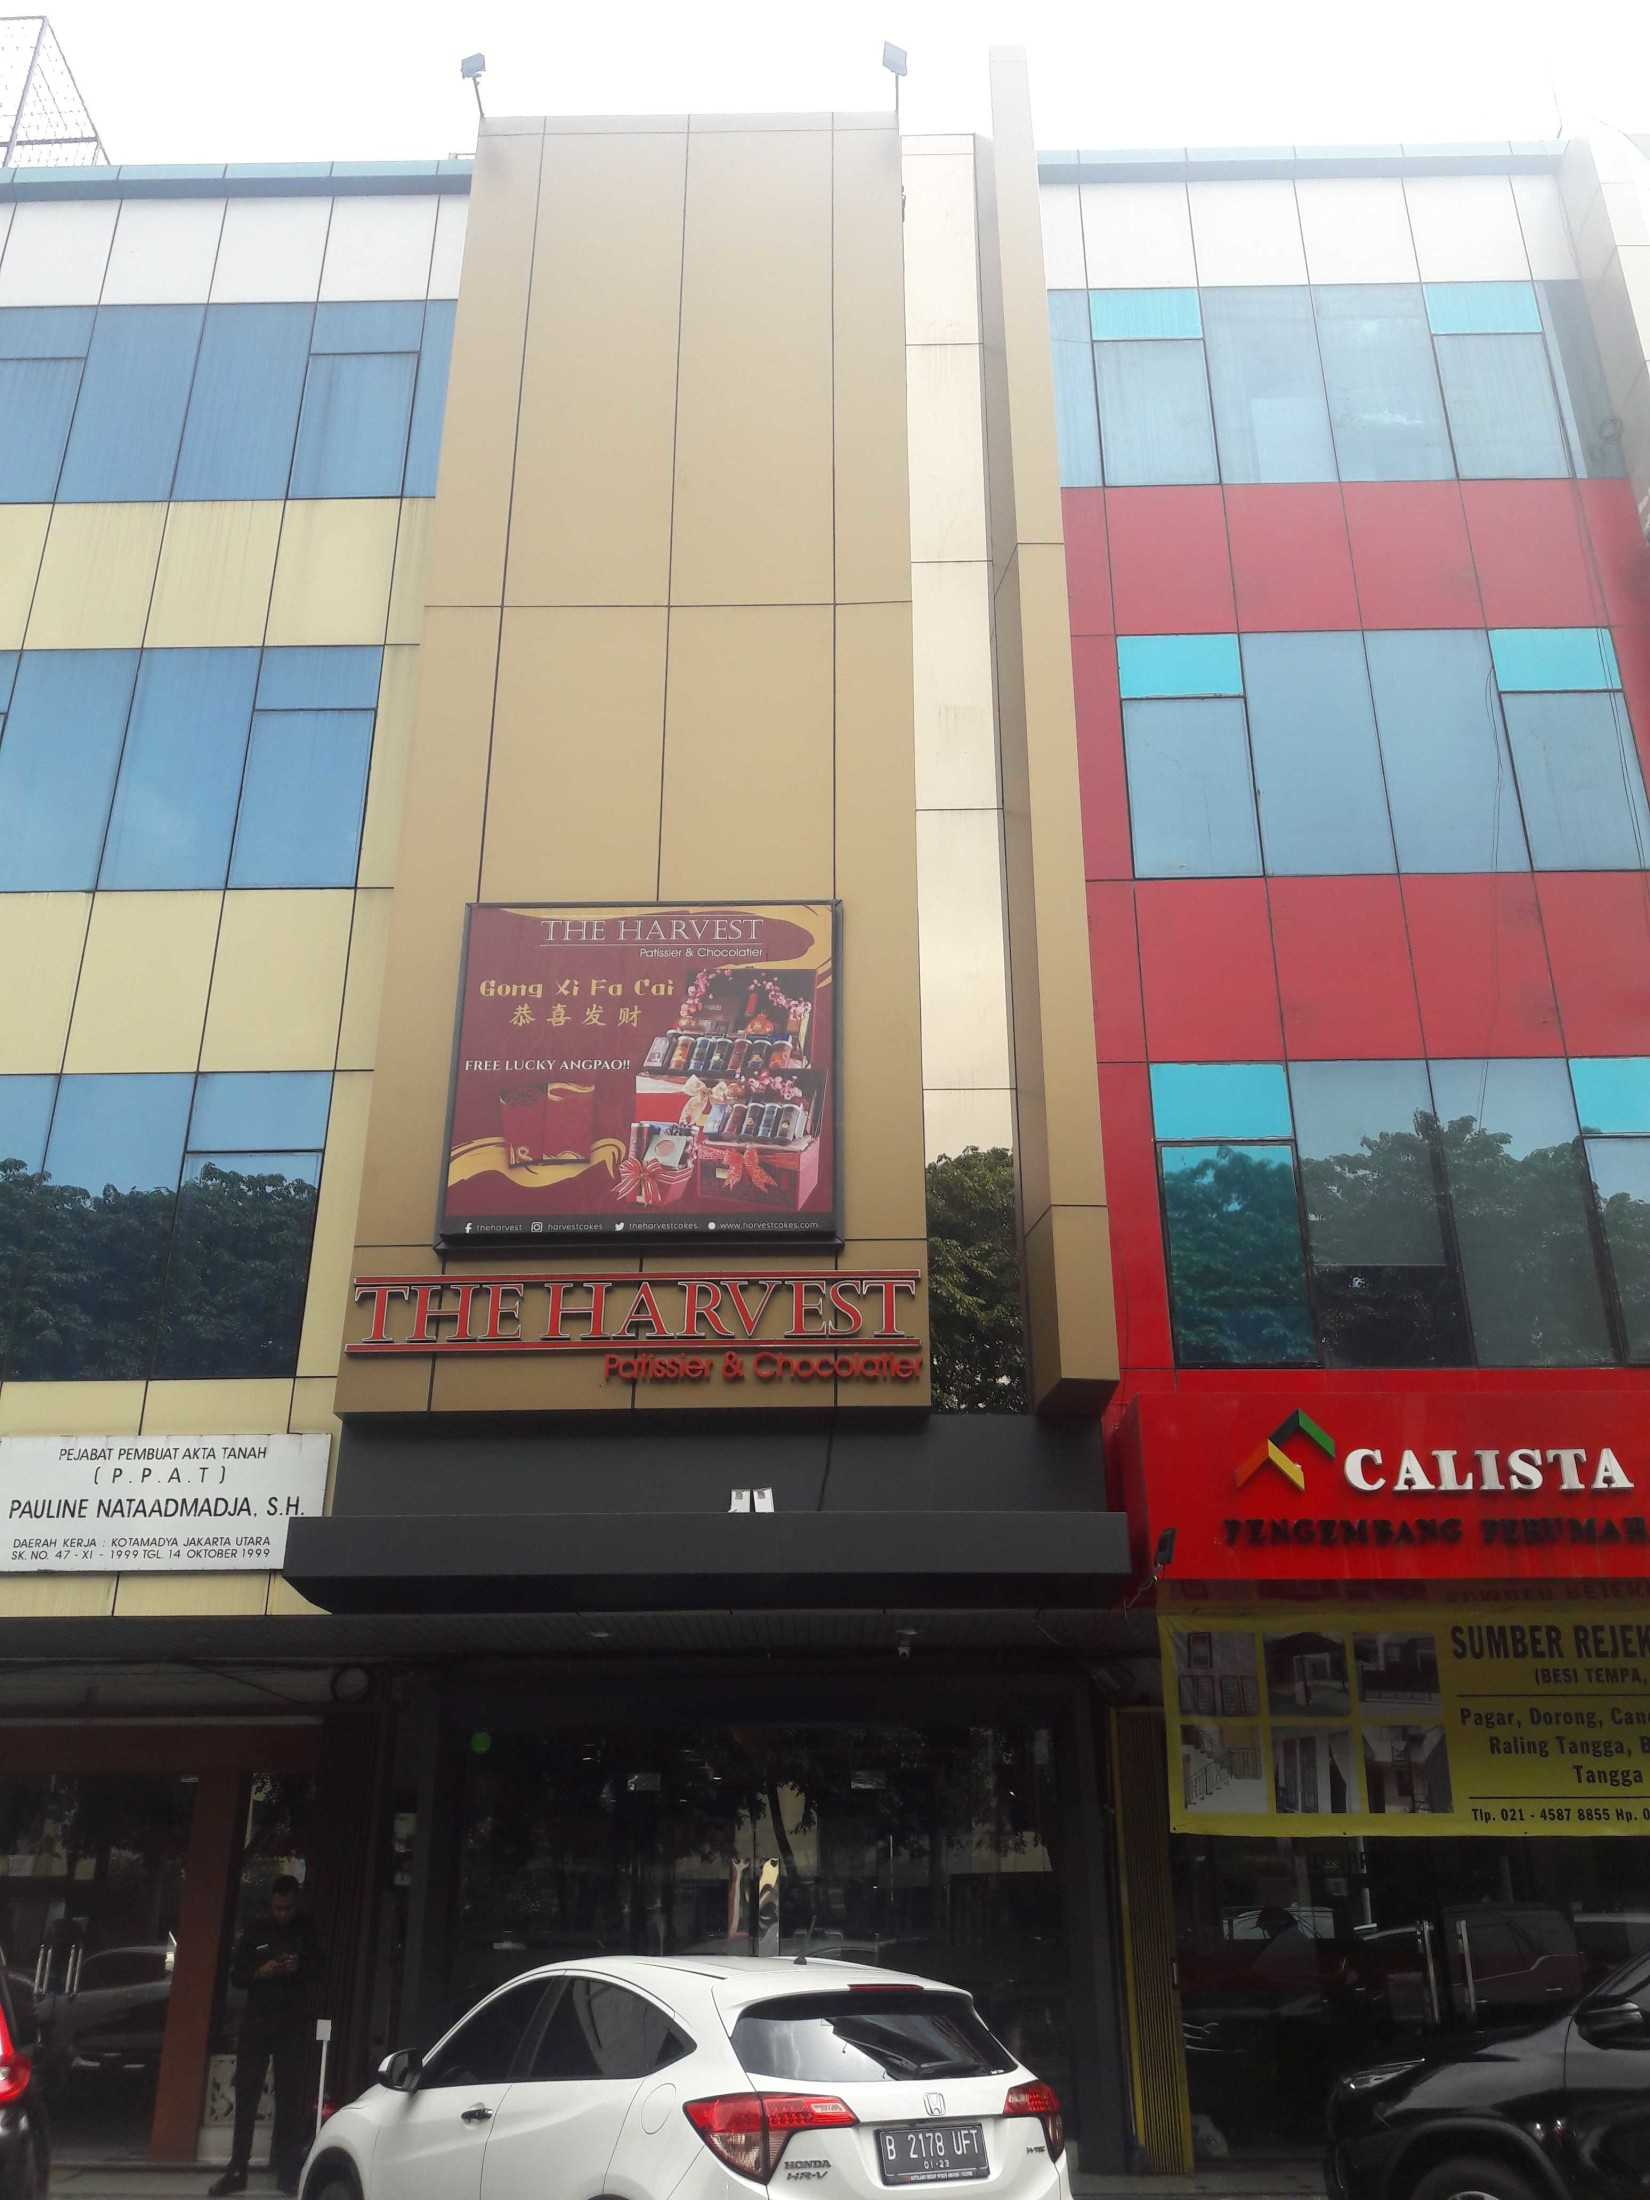 Drajat Food And Baverage Jakarta Utara, Kota Jkt Utara, Daerah Khusus Ibukota Jakarta, Indonesia Jakarta Utara, Kota Jkt Utara, Daerah Khusus Ibukota Jakarta, Indonesia Drajat-Food-And-Baverage  76137